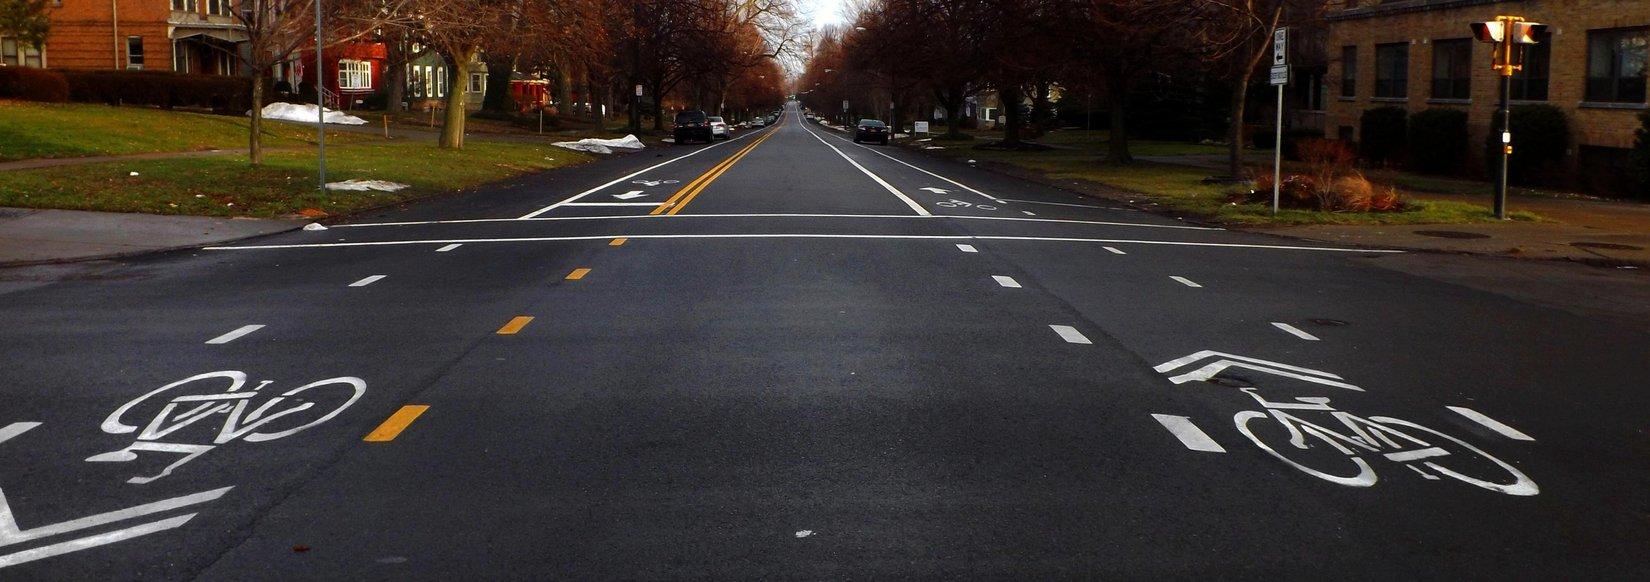 Linwood_bike_lanes